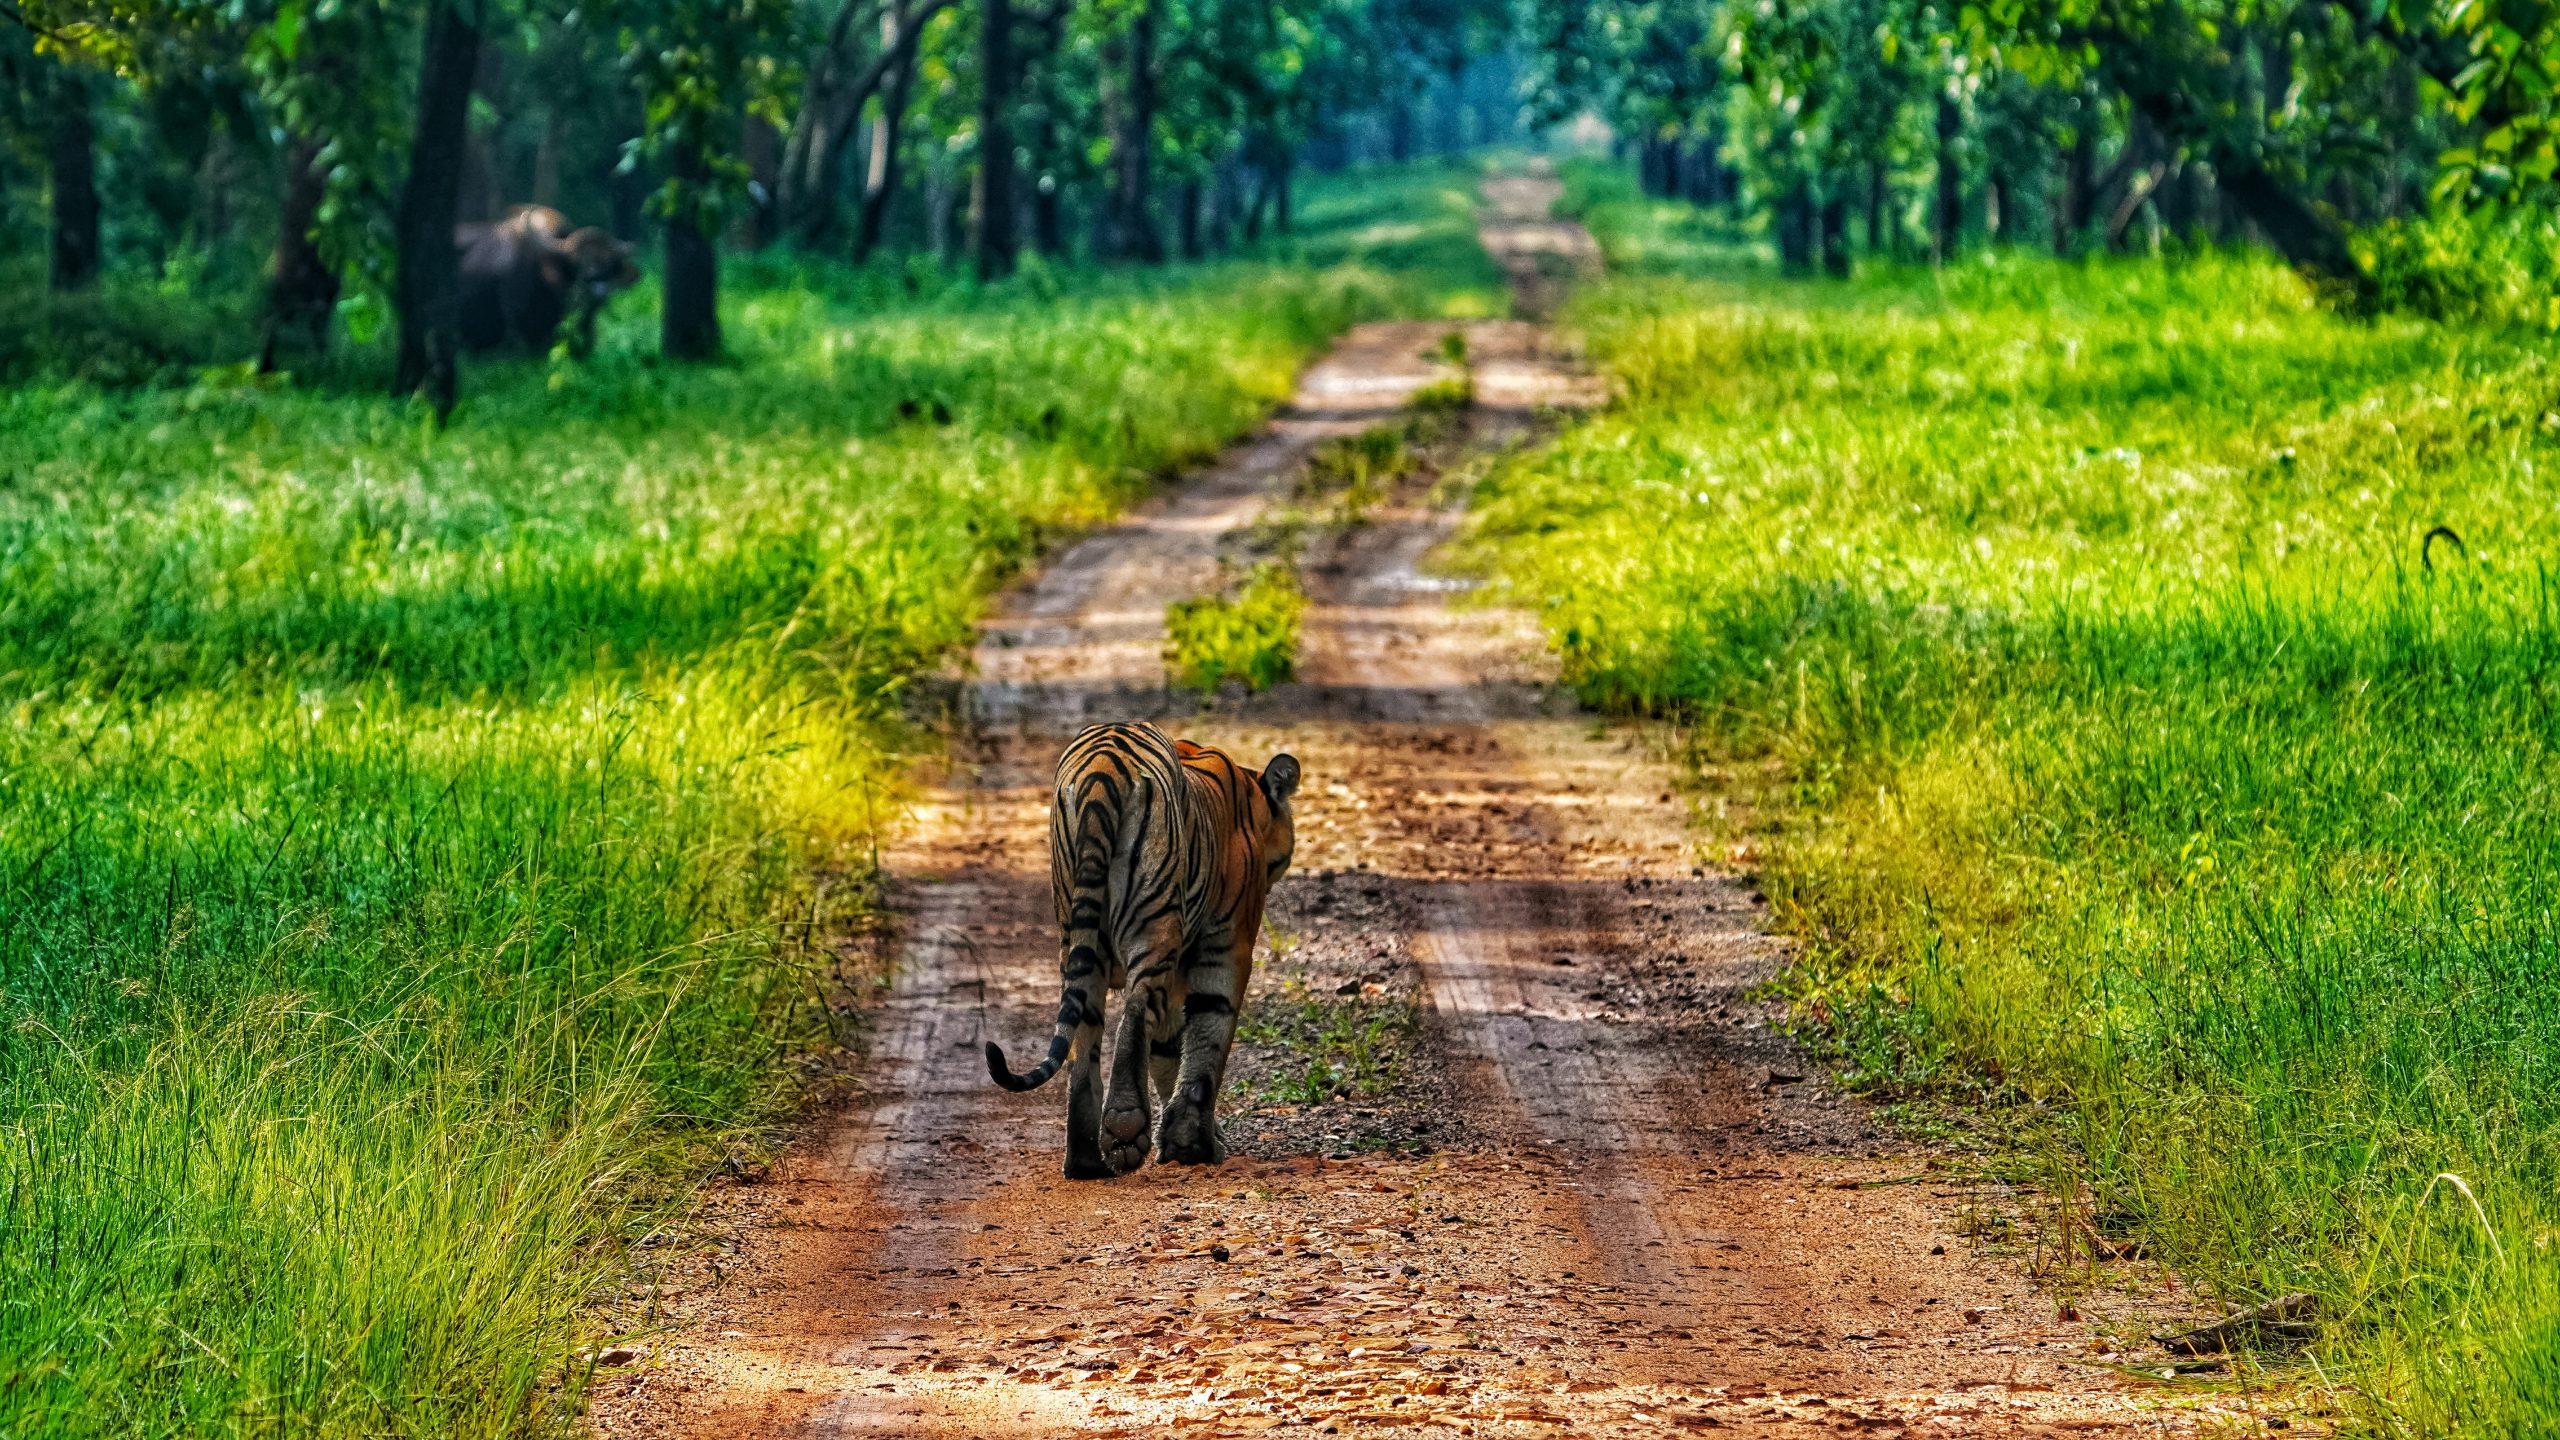 Tiger walking in a wildlife santuary